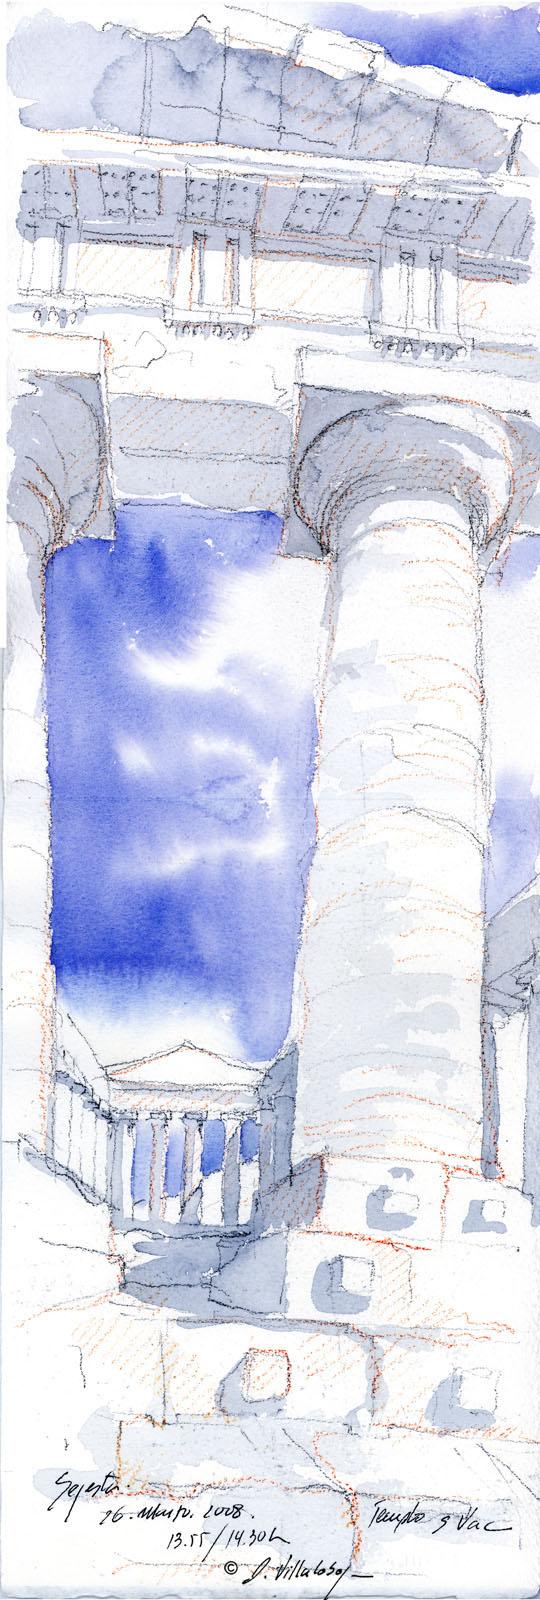 danielvillalobos-sketchbooks-skechtravelsexhibition-16